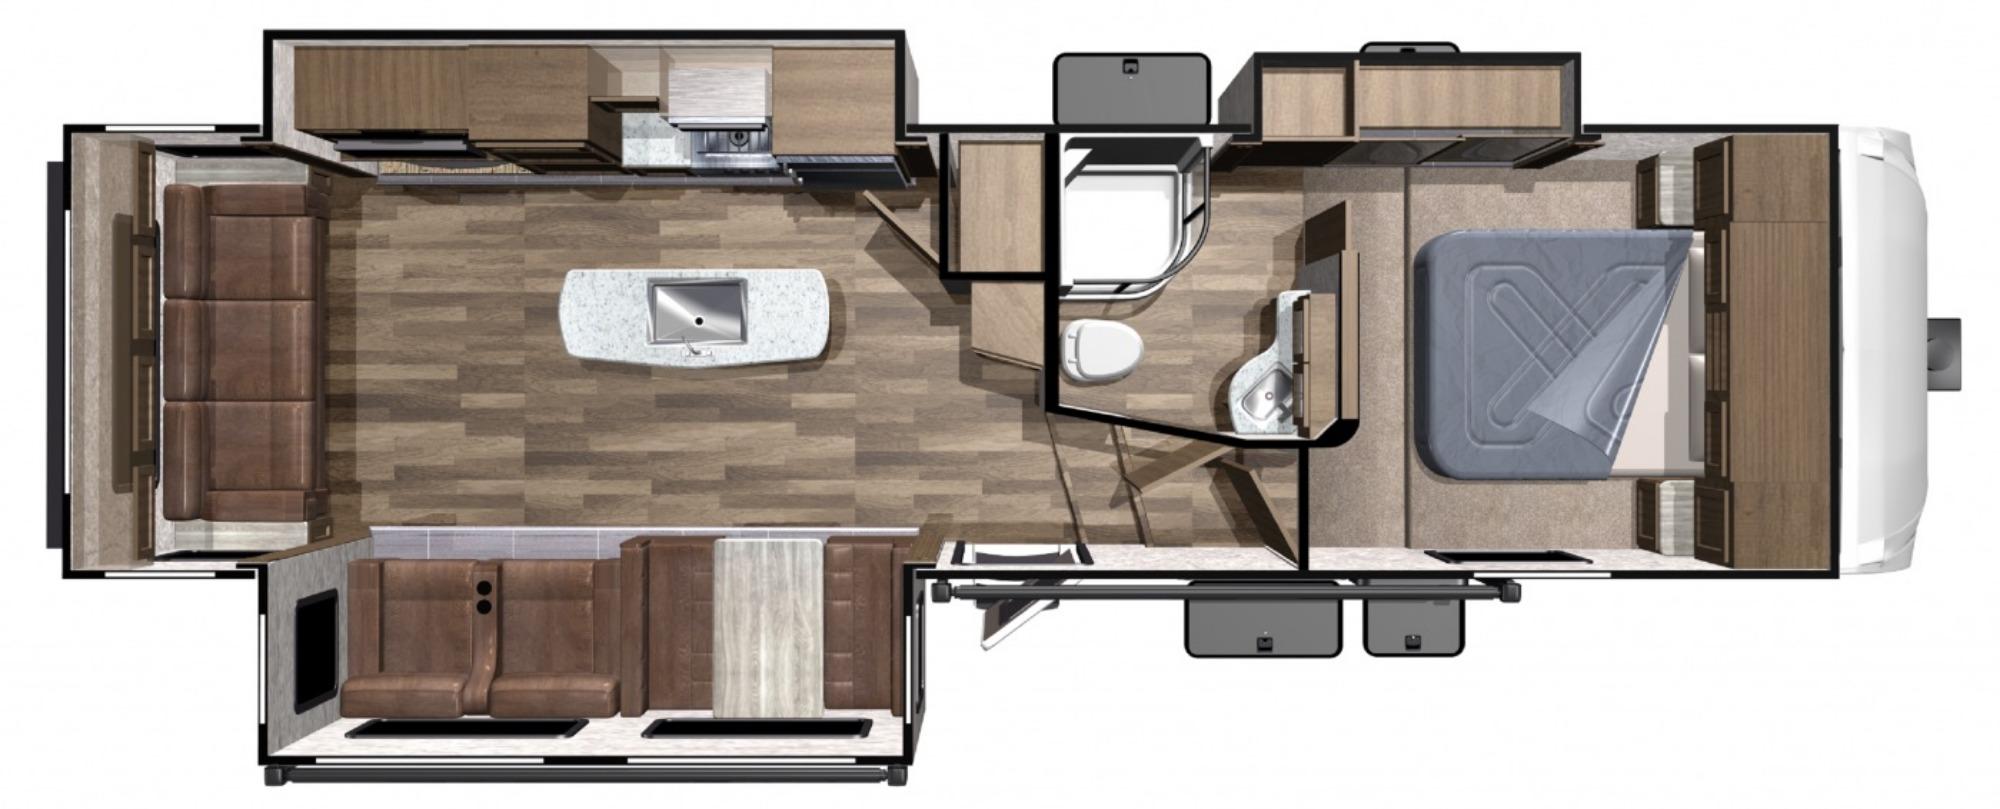 Exterior : 2019-HIGHLAND RIDGE-F291RLS